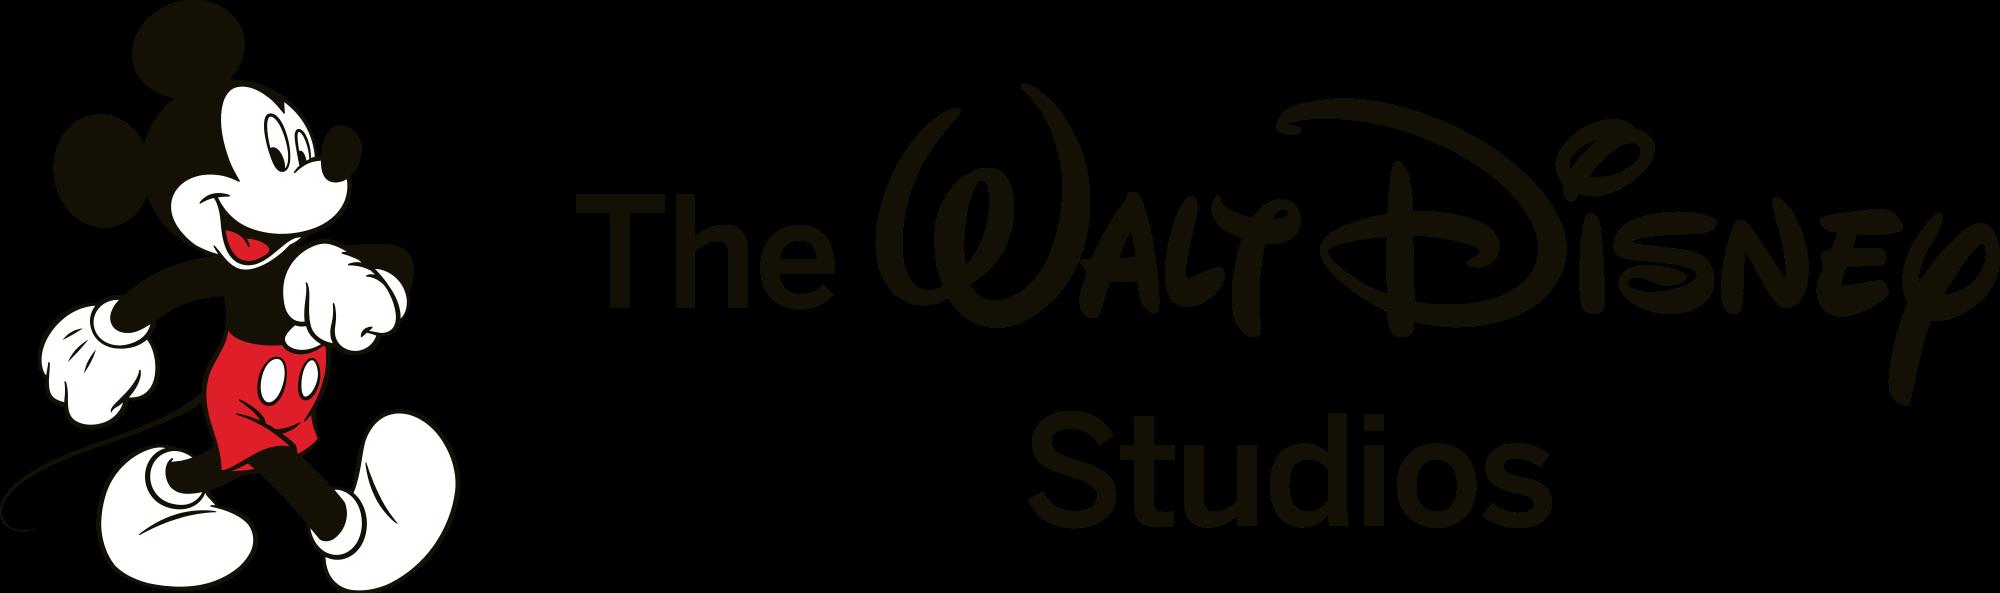 2000px-The Walt Disney Studios logo.png